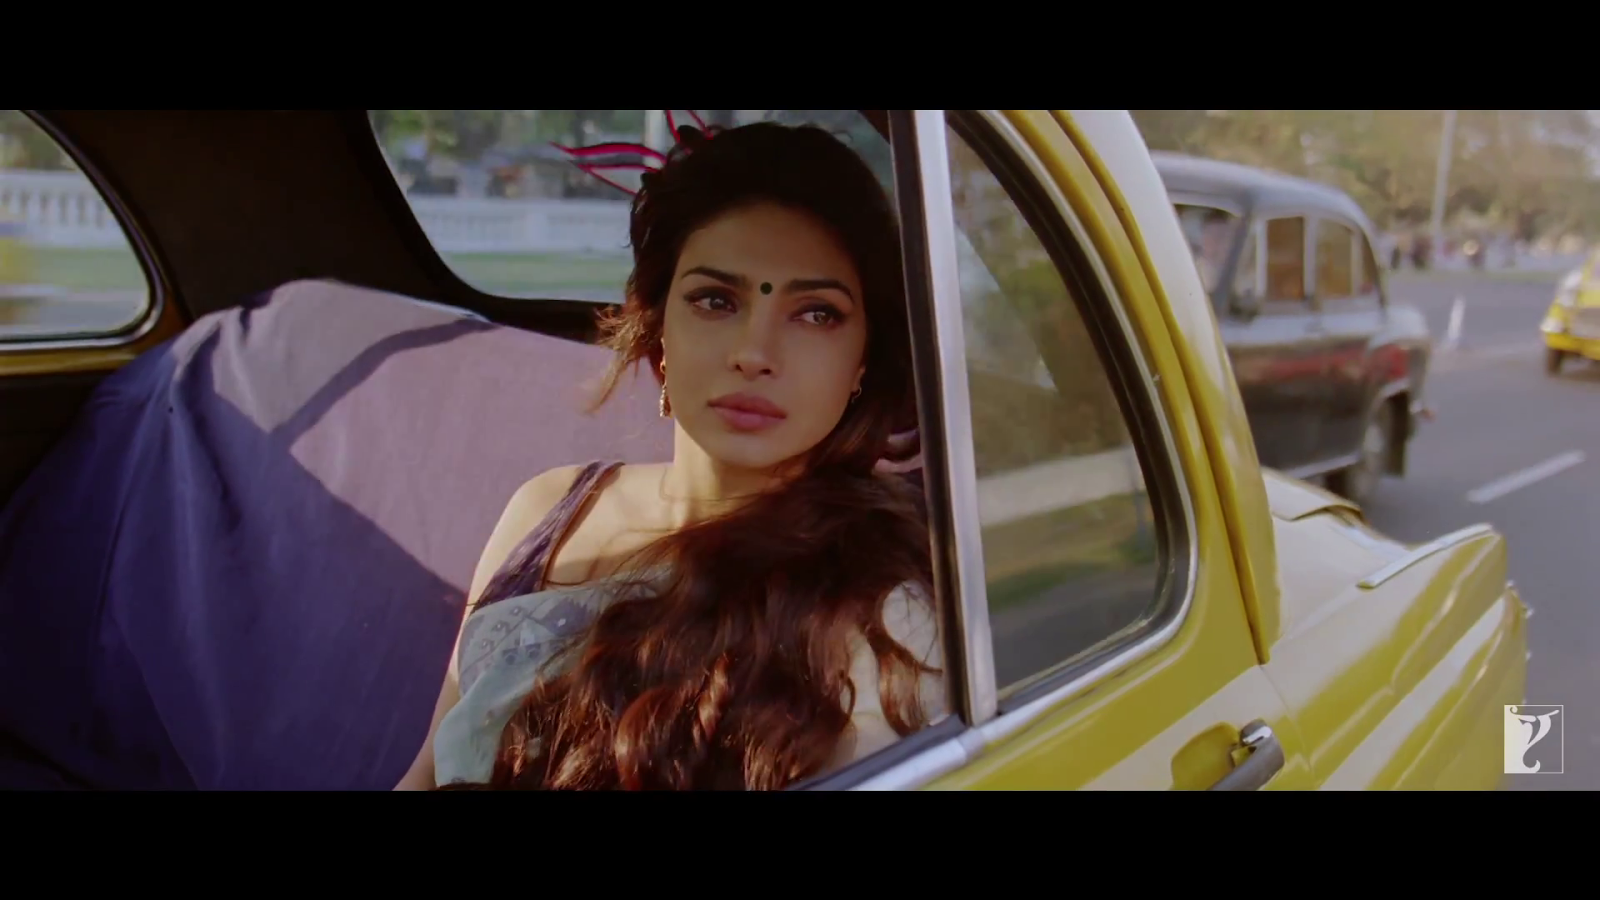 Gunday (2014) All Video Songs Full - Web Hd - 1080P - Term IcTv